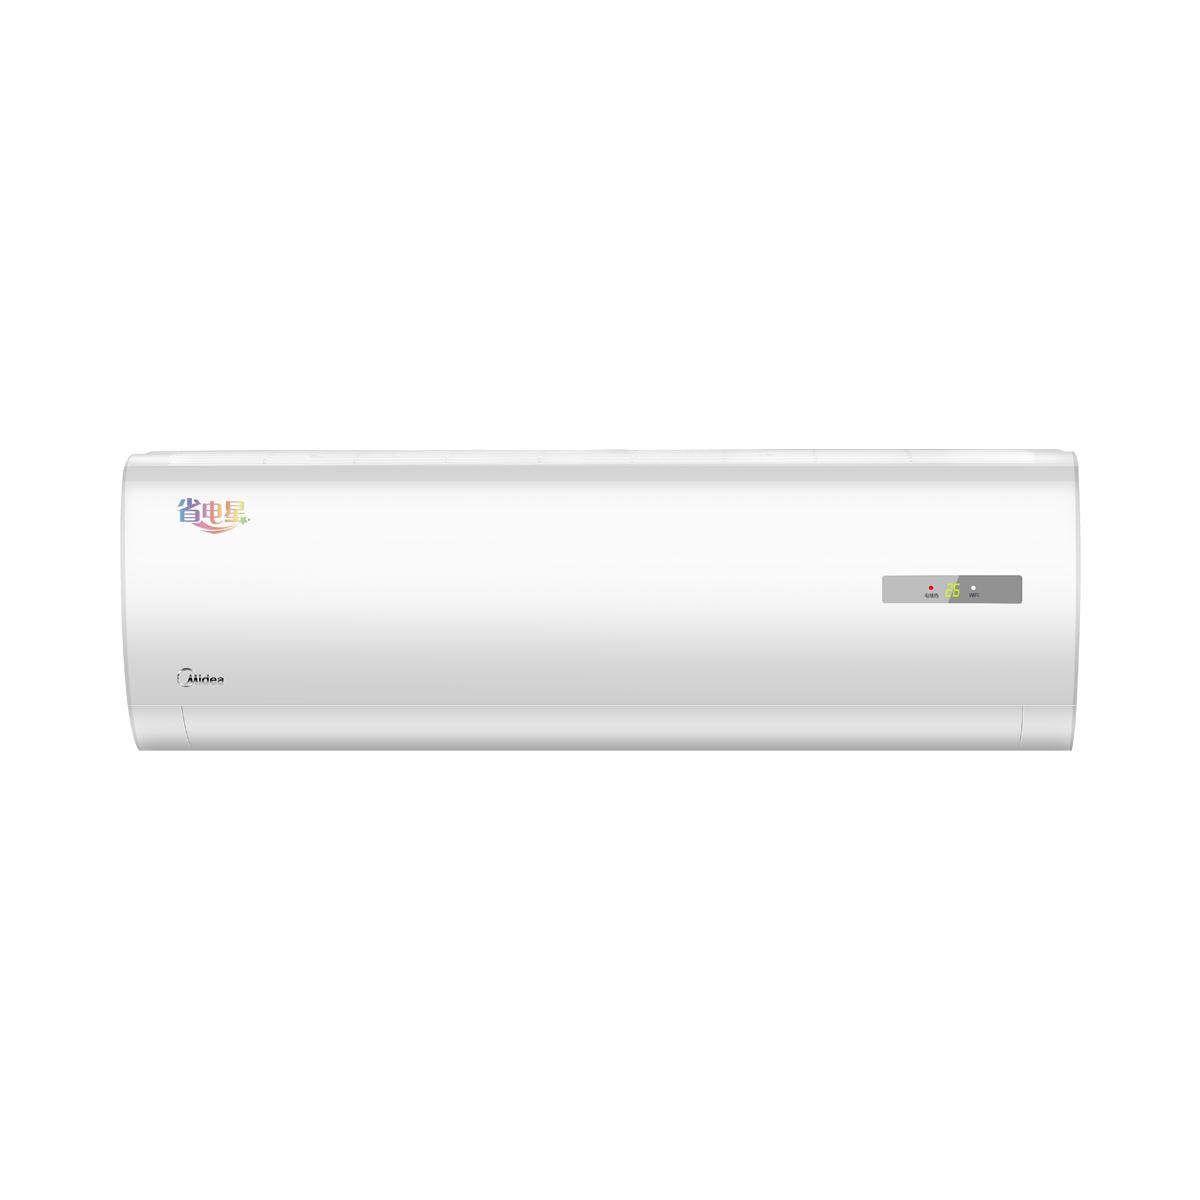 Midea/美的 KFR-50GW/DY-DA400(D3)家用空调套机 说明书.pdf